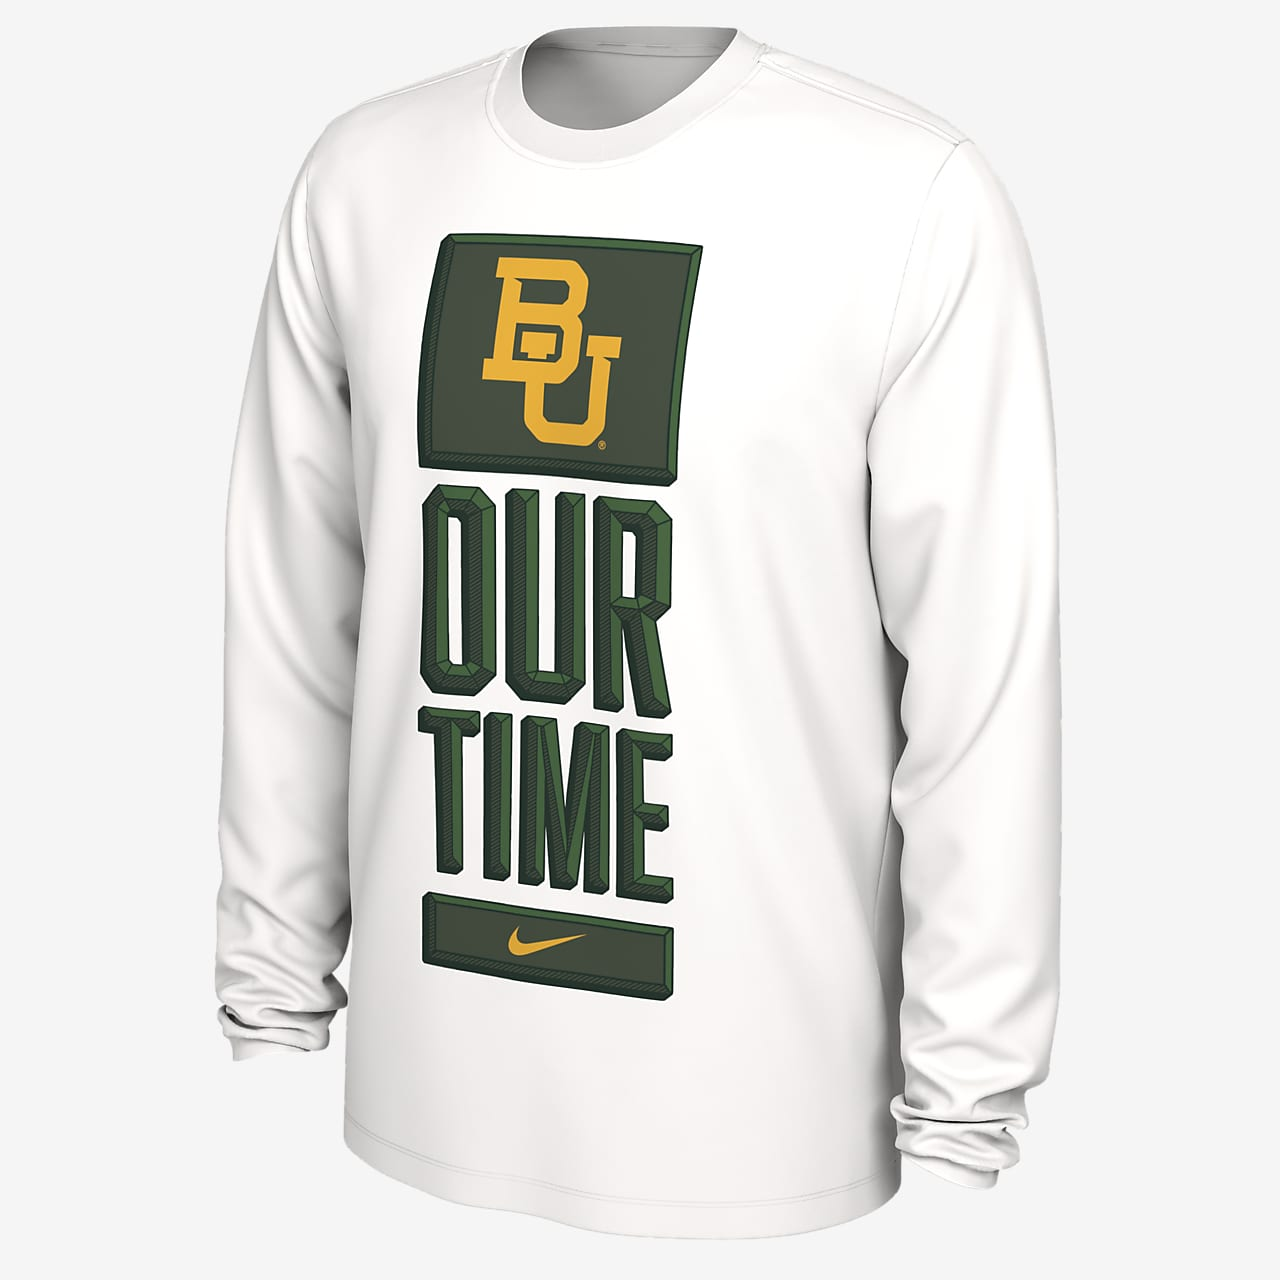 Nike College Dri-FIT (Baylor) Men's Long-Sleeve T-Shirt